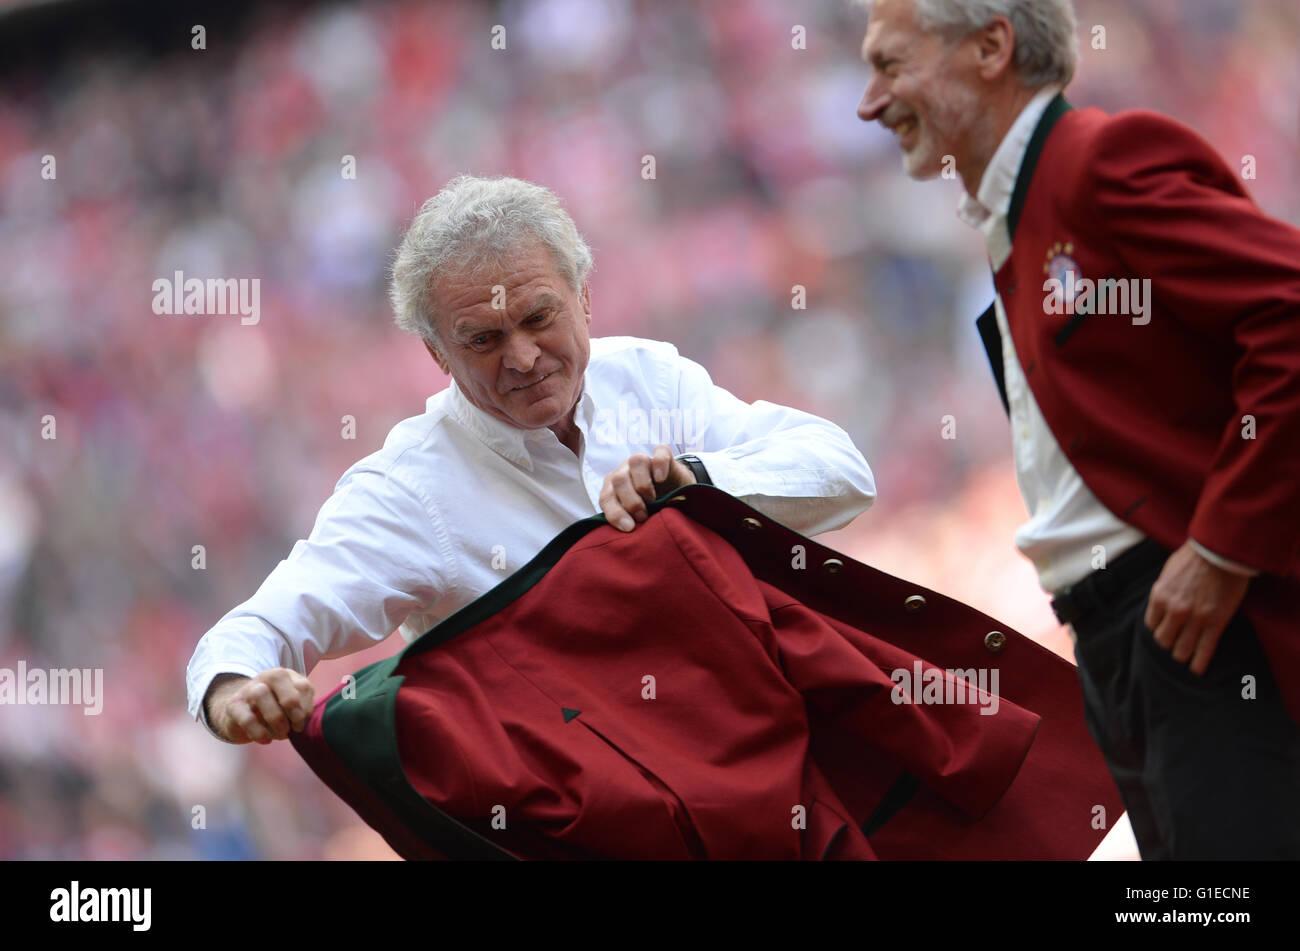 Munich Germany 14th May 2016 Munich s former goalie Sepp Maier